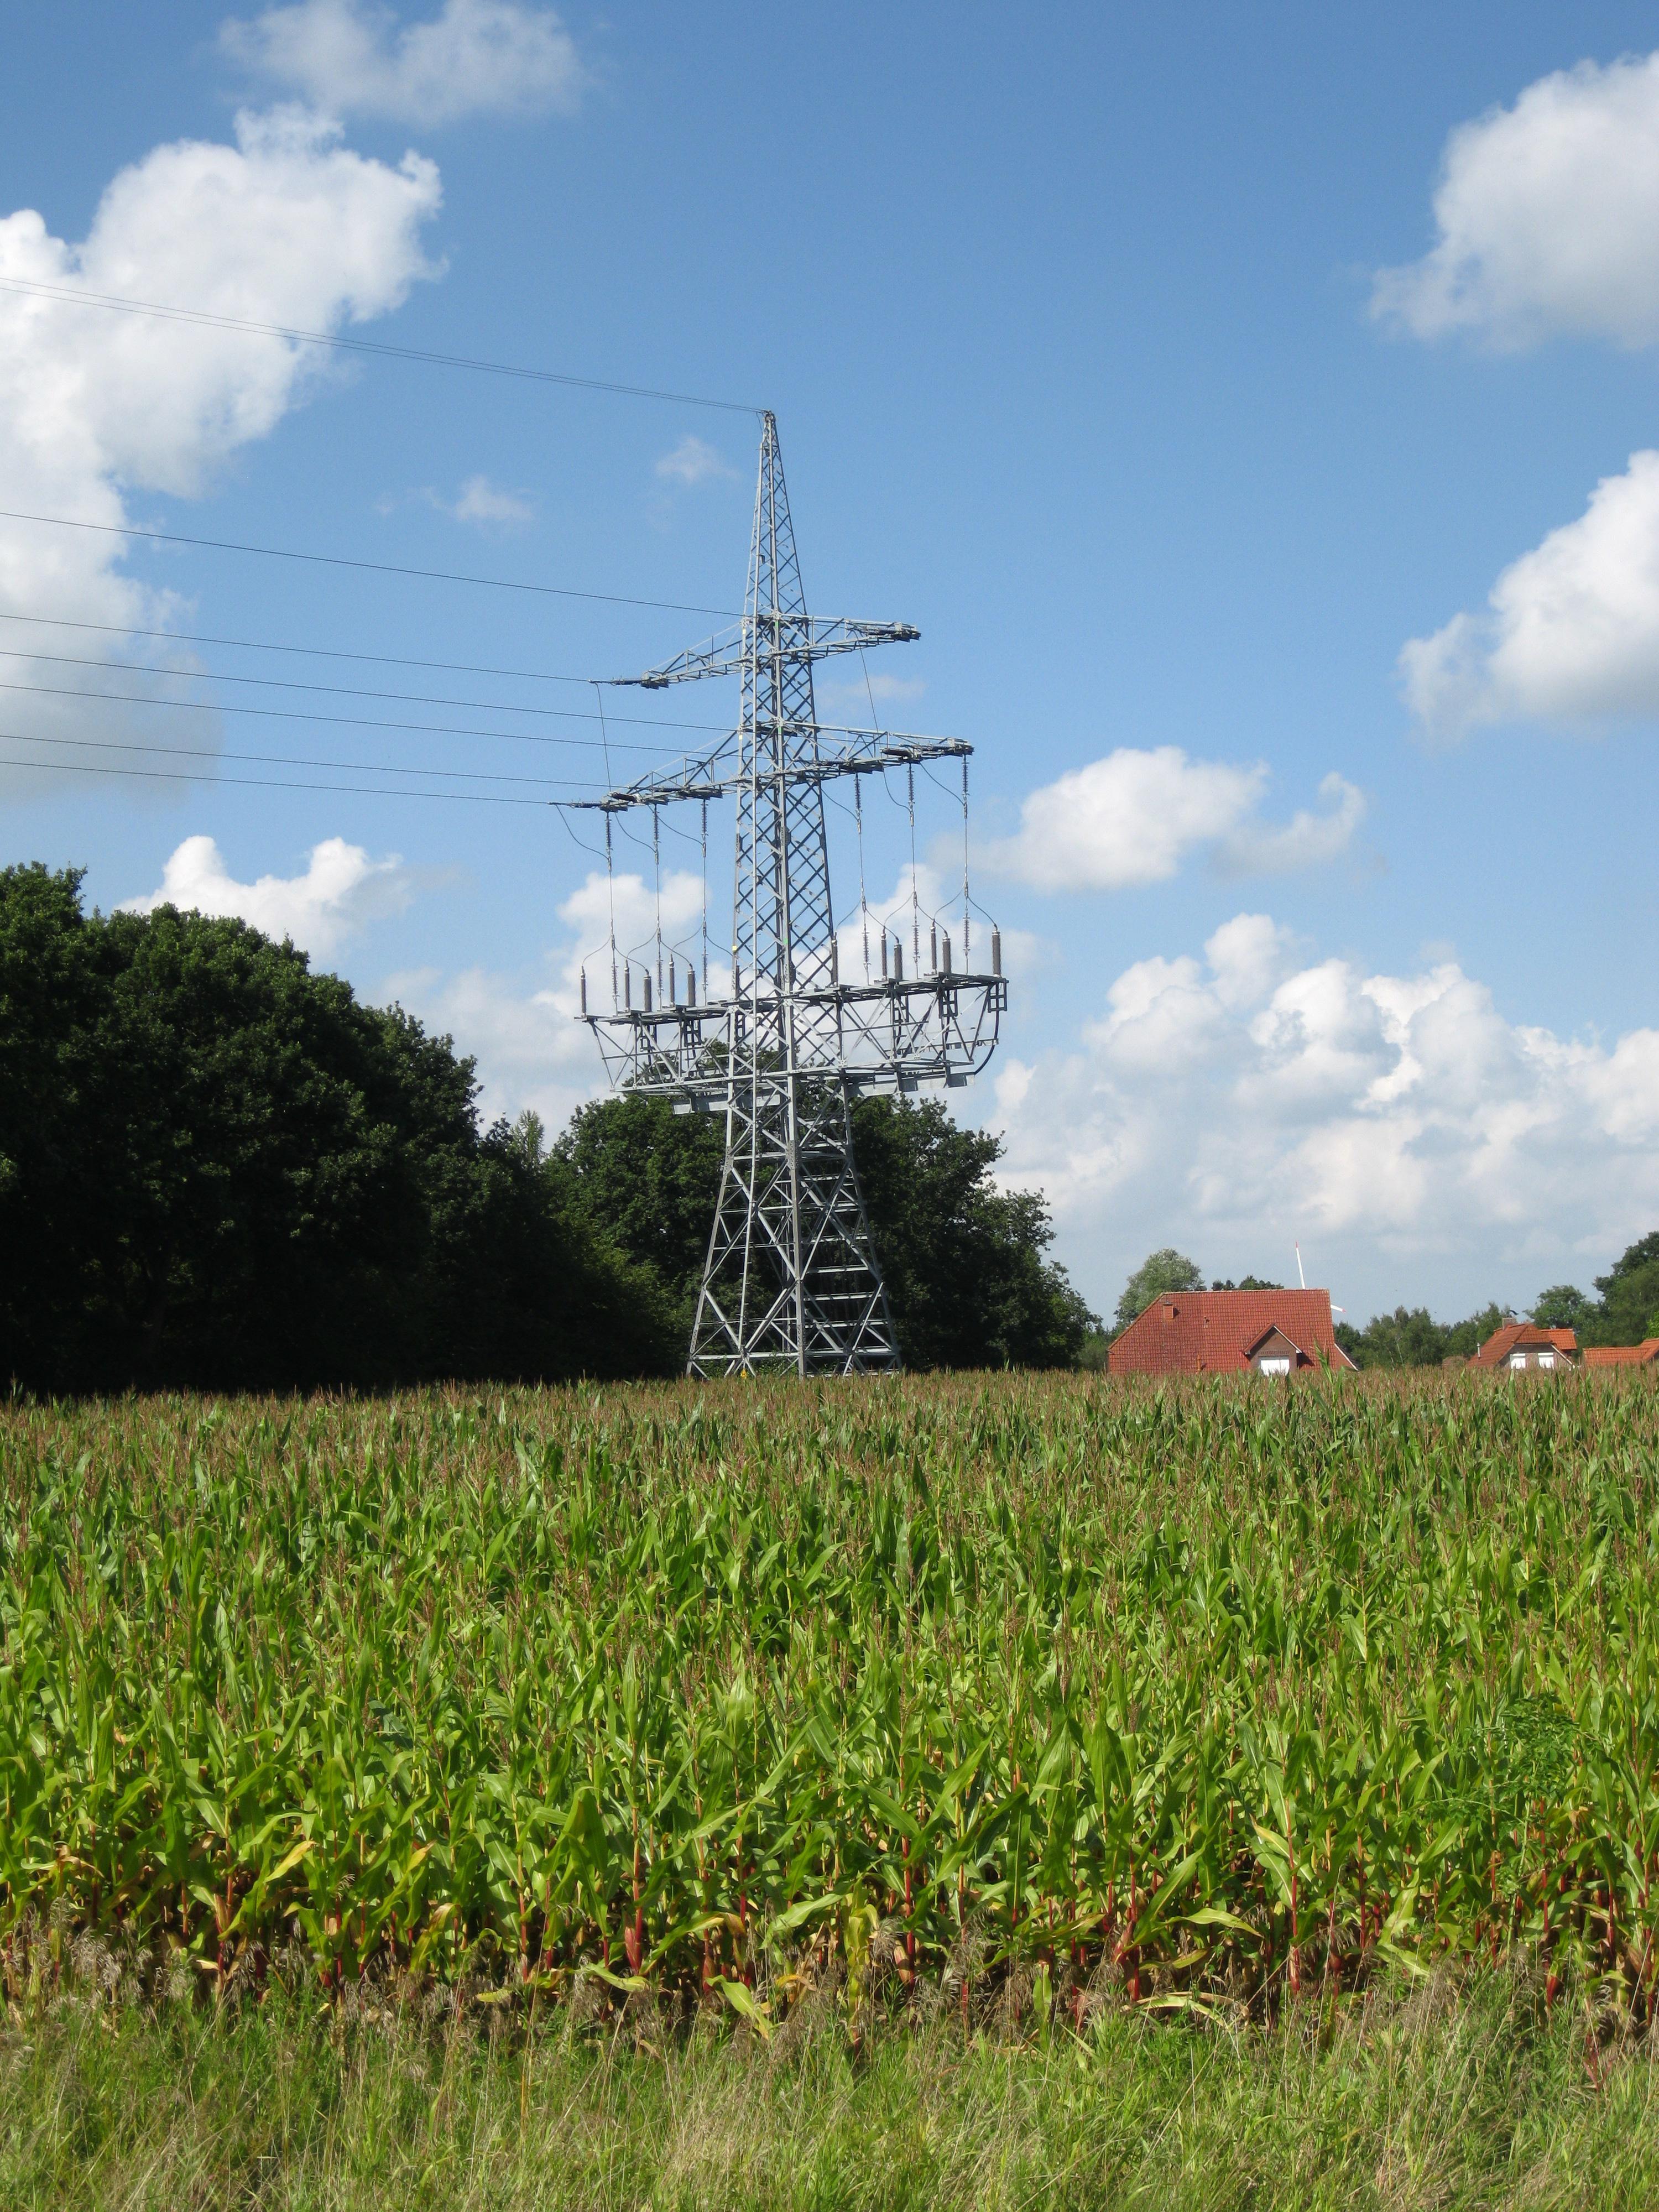 File:Freileitung-erdkabel-uebergabe.jpg - Wikimedia Commons